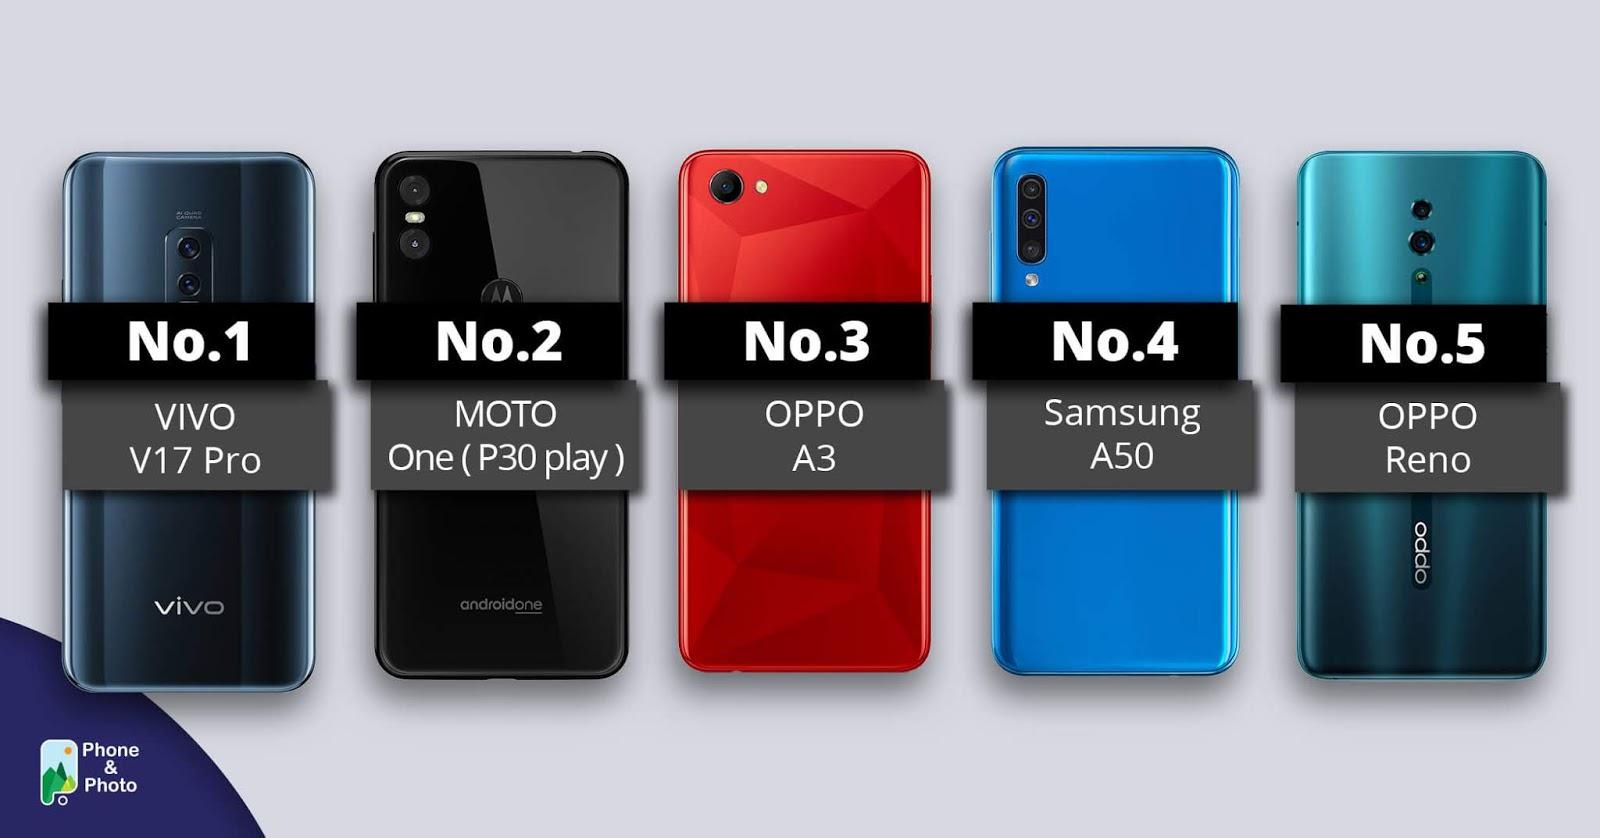 Top 10 Best Camera Phone of Feb. 2020 Under USD 500_Top 5~Top 1